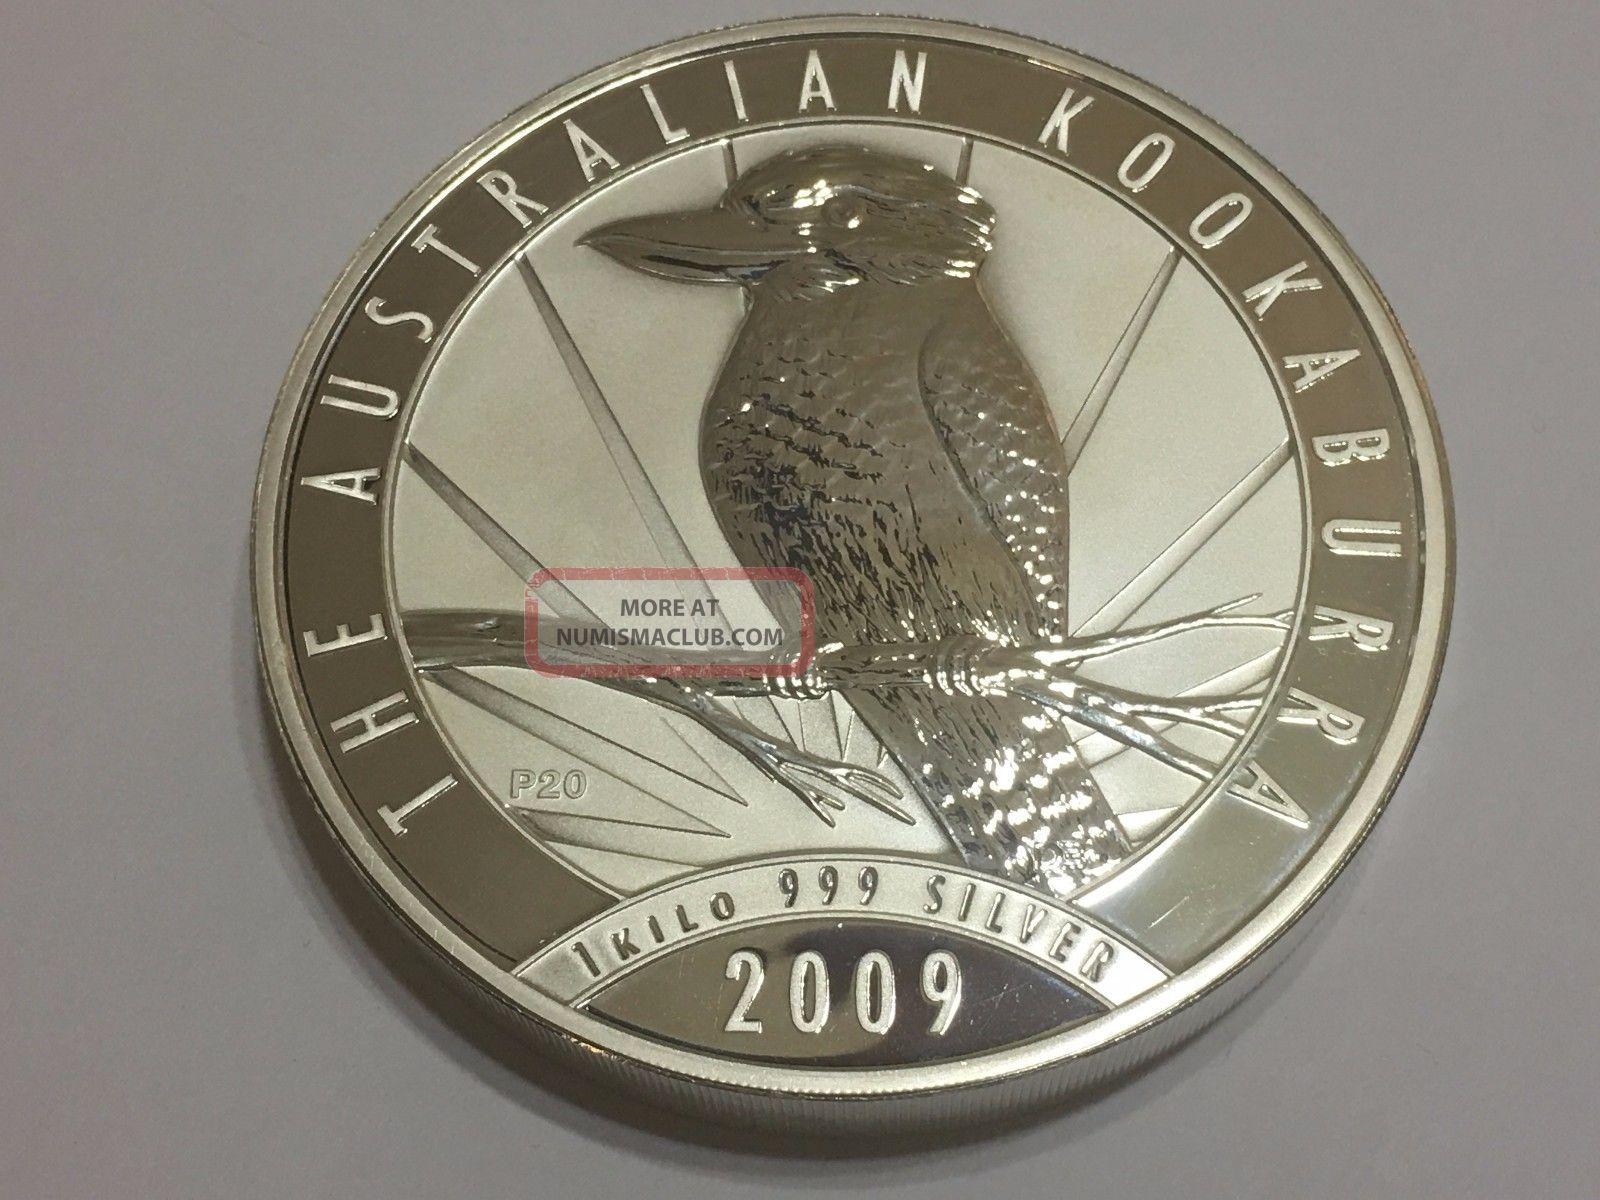 1 Kilo (32.  15 Oz) Austrailian 2009 Kookaburra 999 Fine Silver Coin Coins: World photo